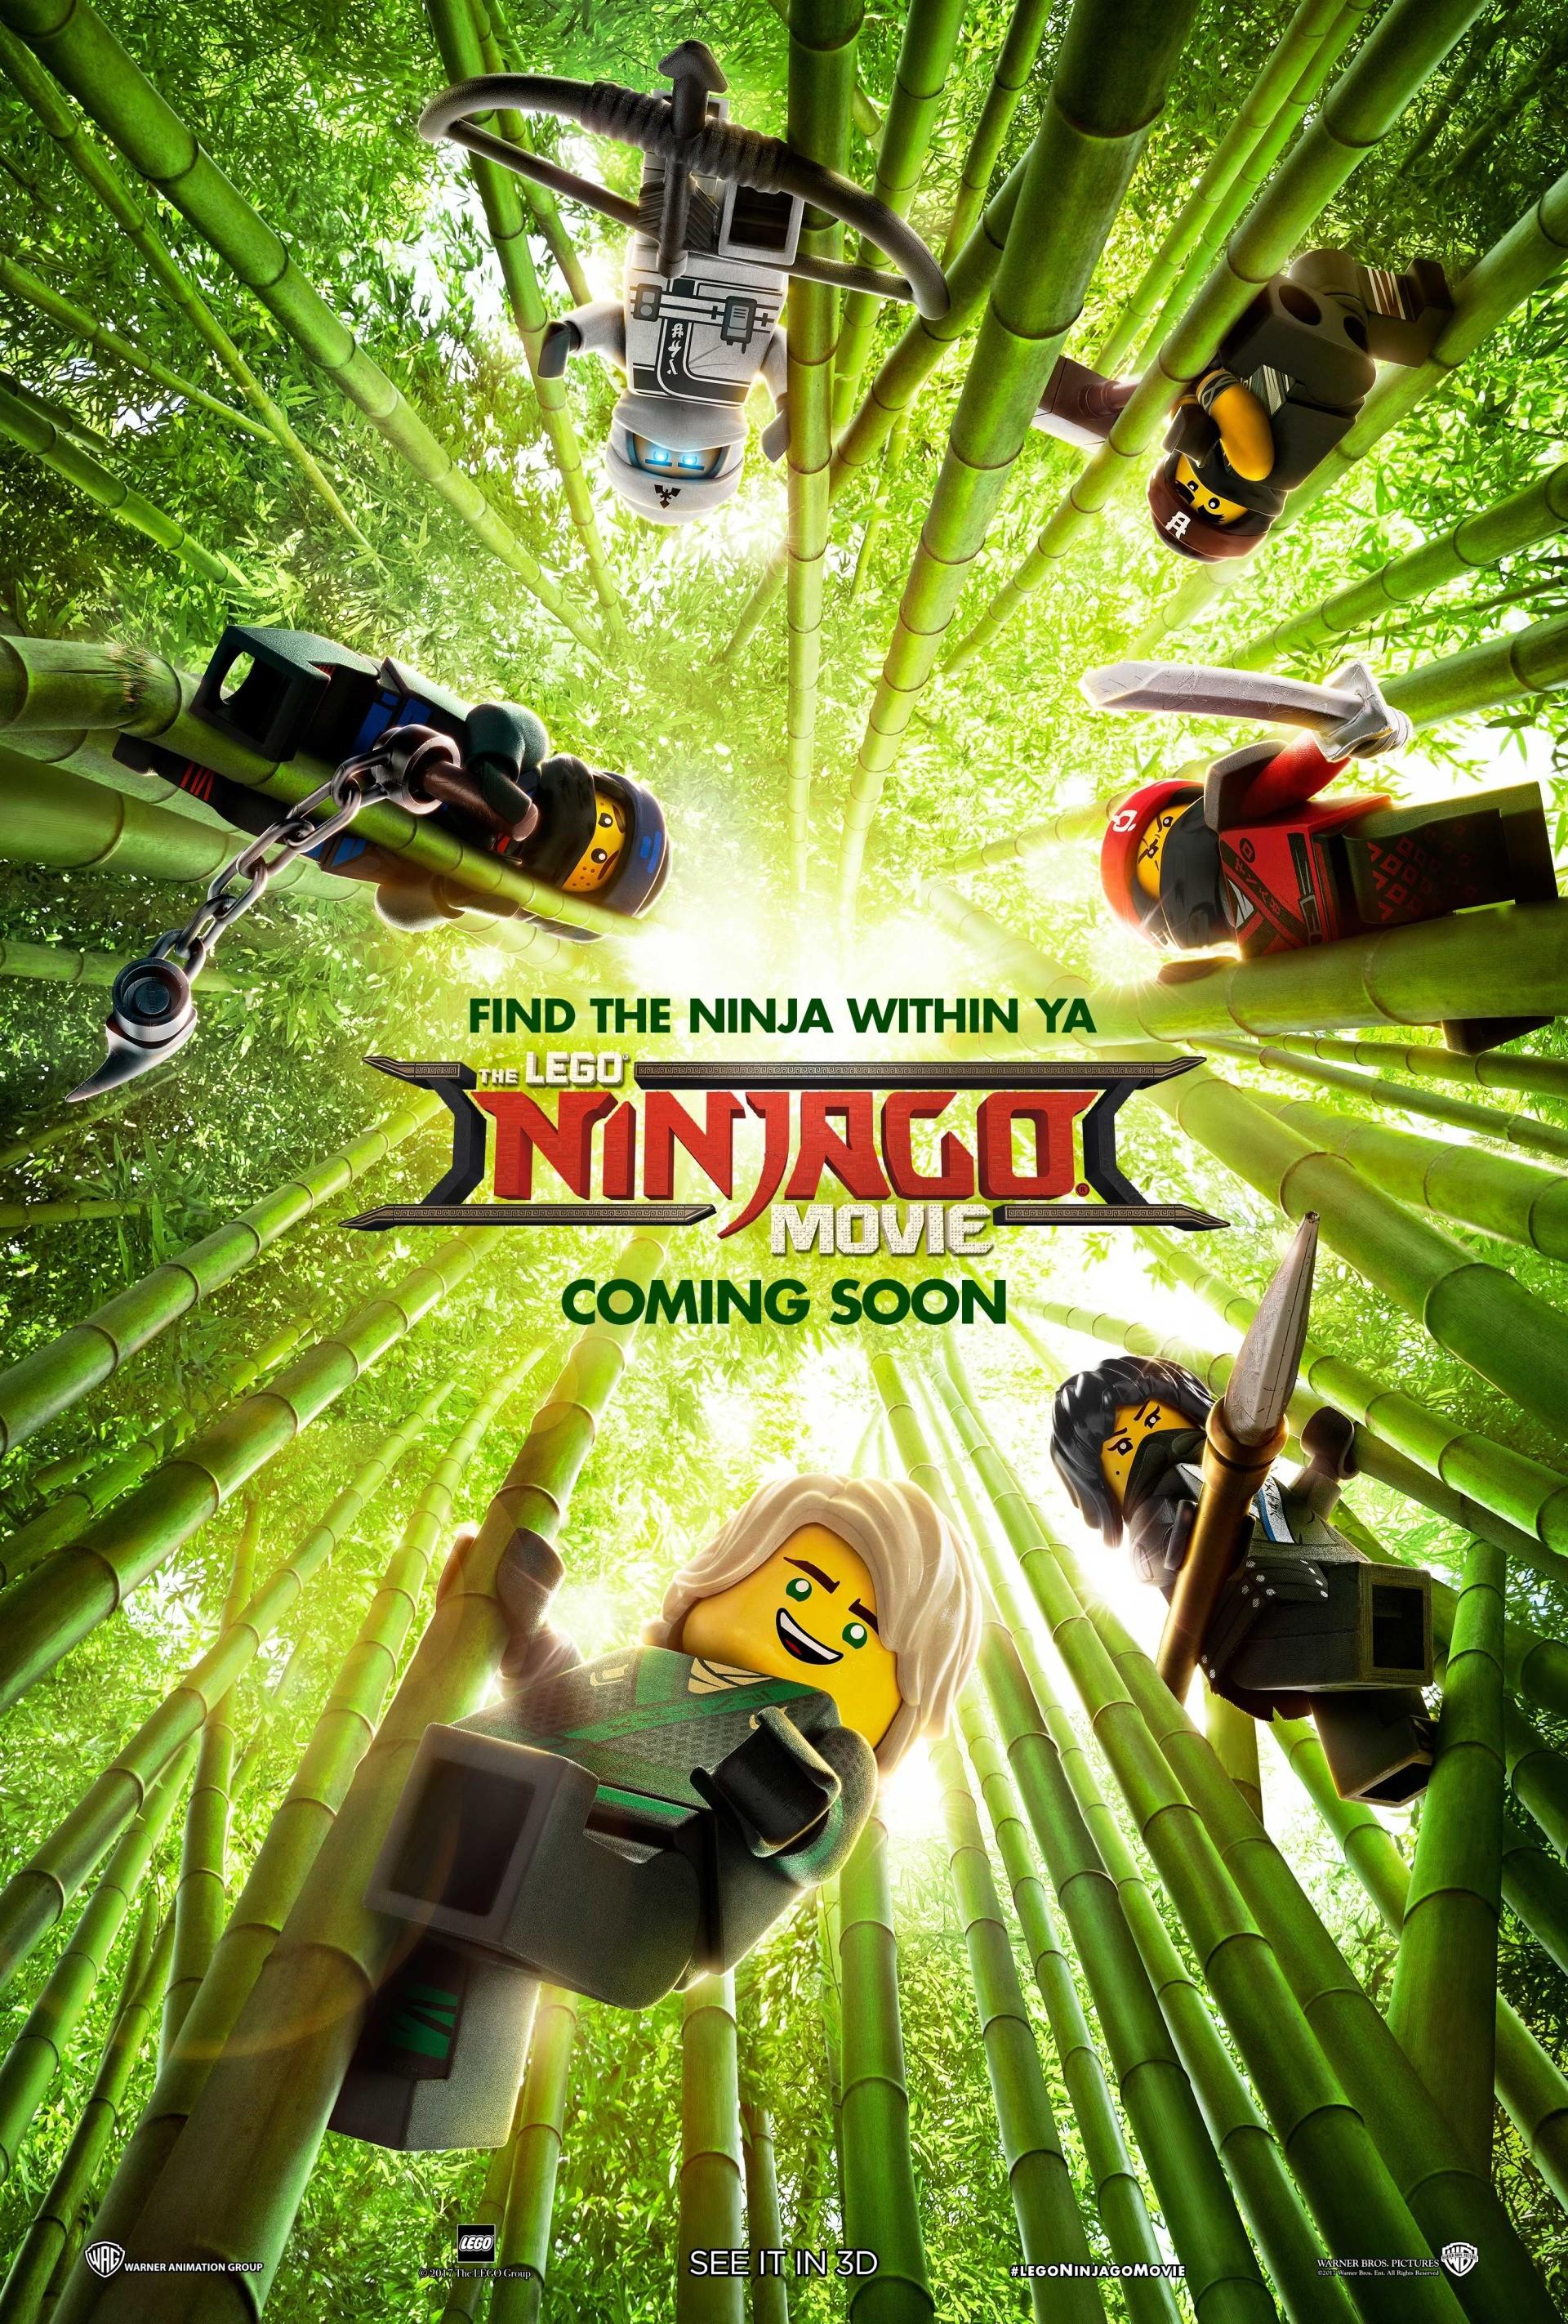 The Lego Ninjago Movie (2017) HD Wallpaper From Gallsource.com